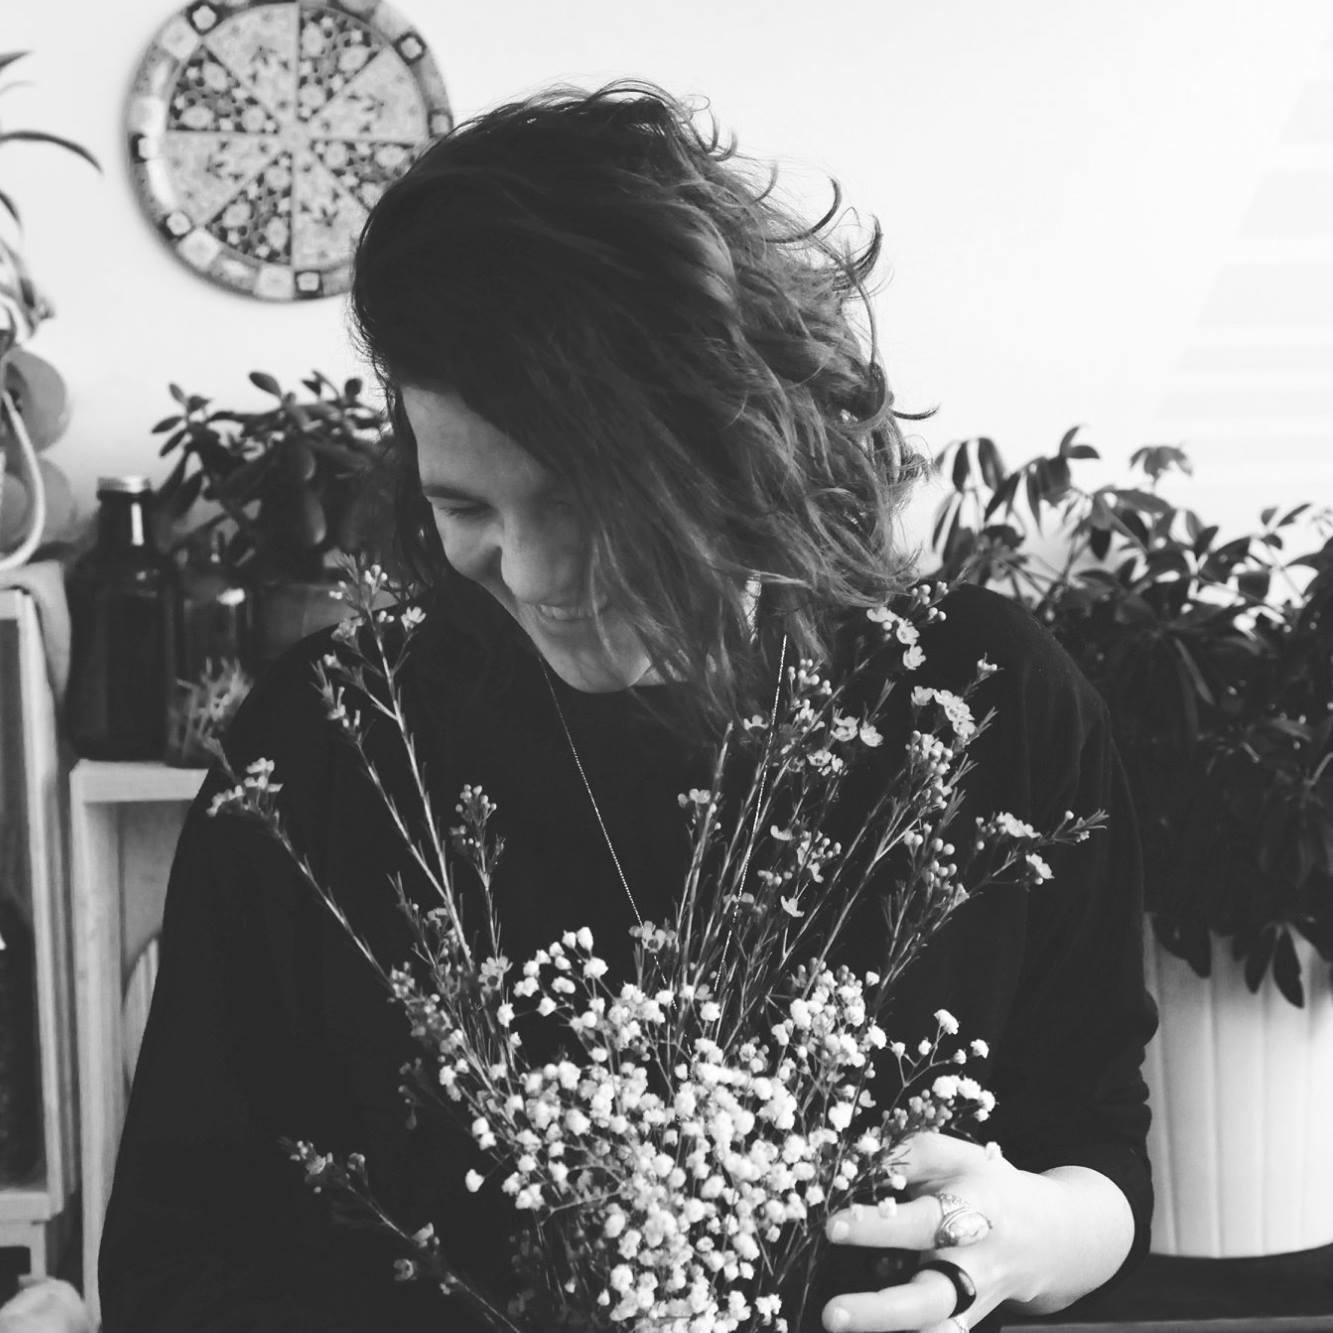 Alexandra Zawadzki-Turcotte